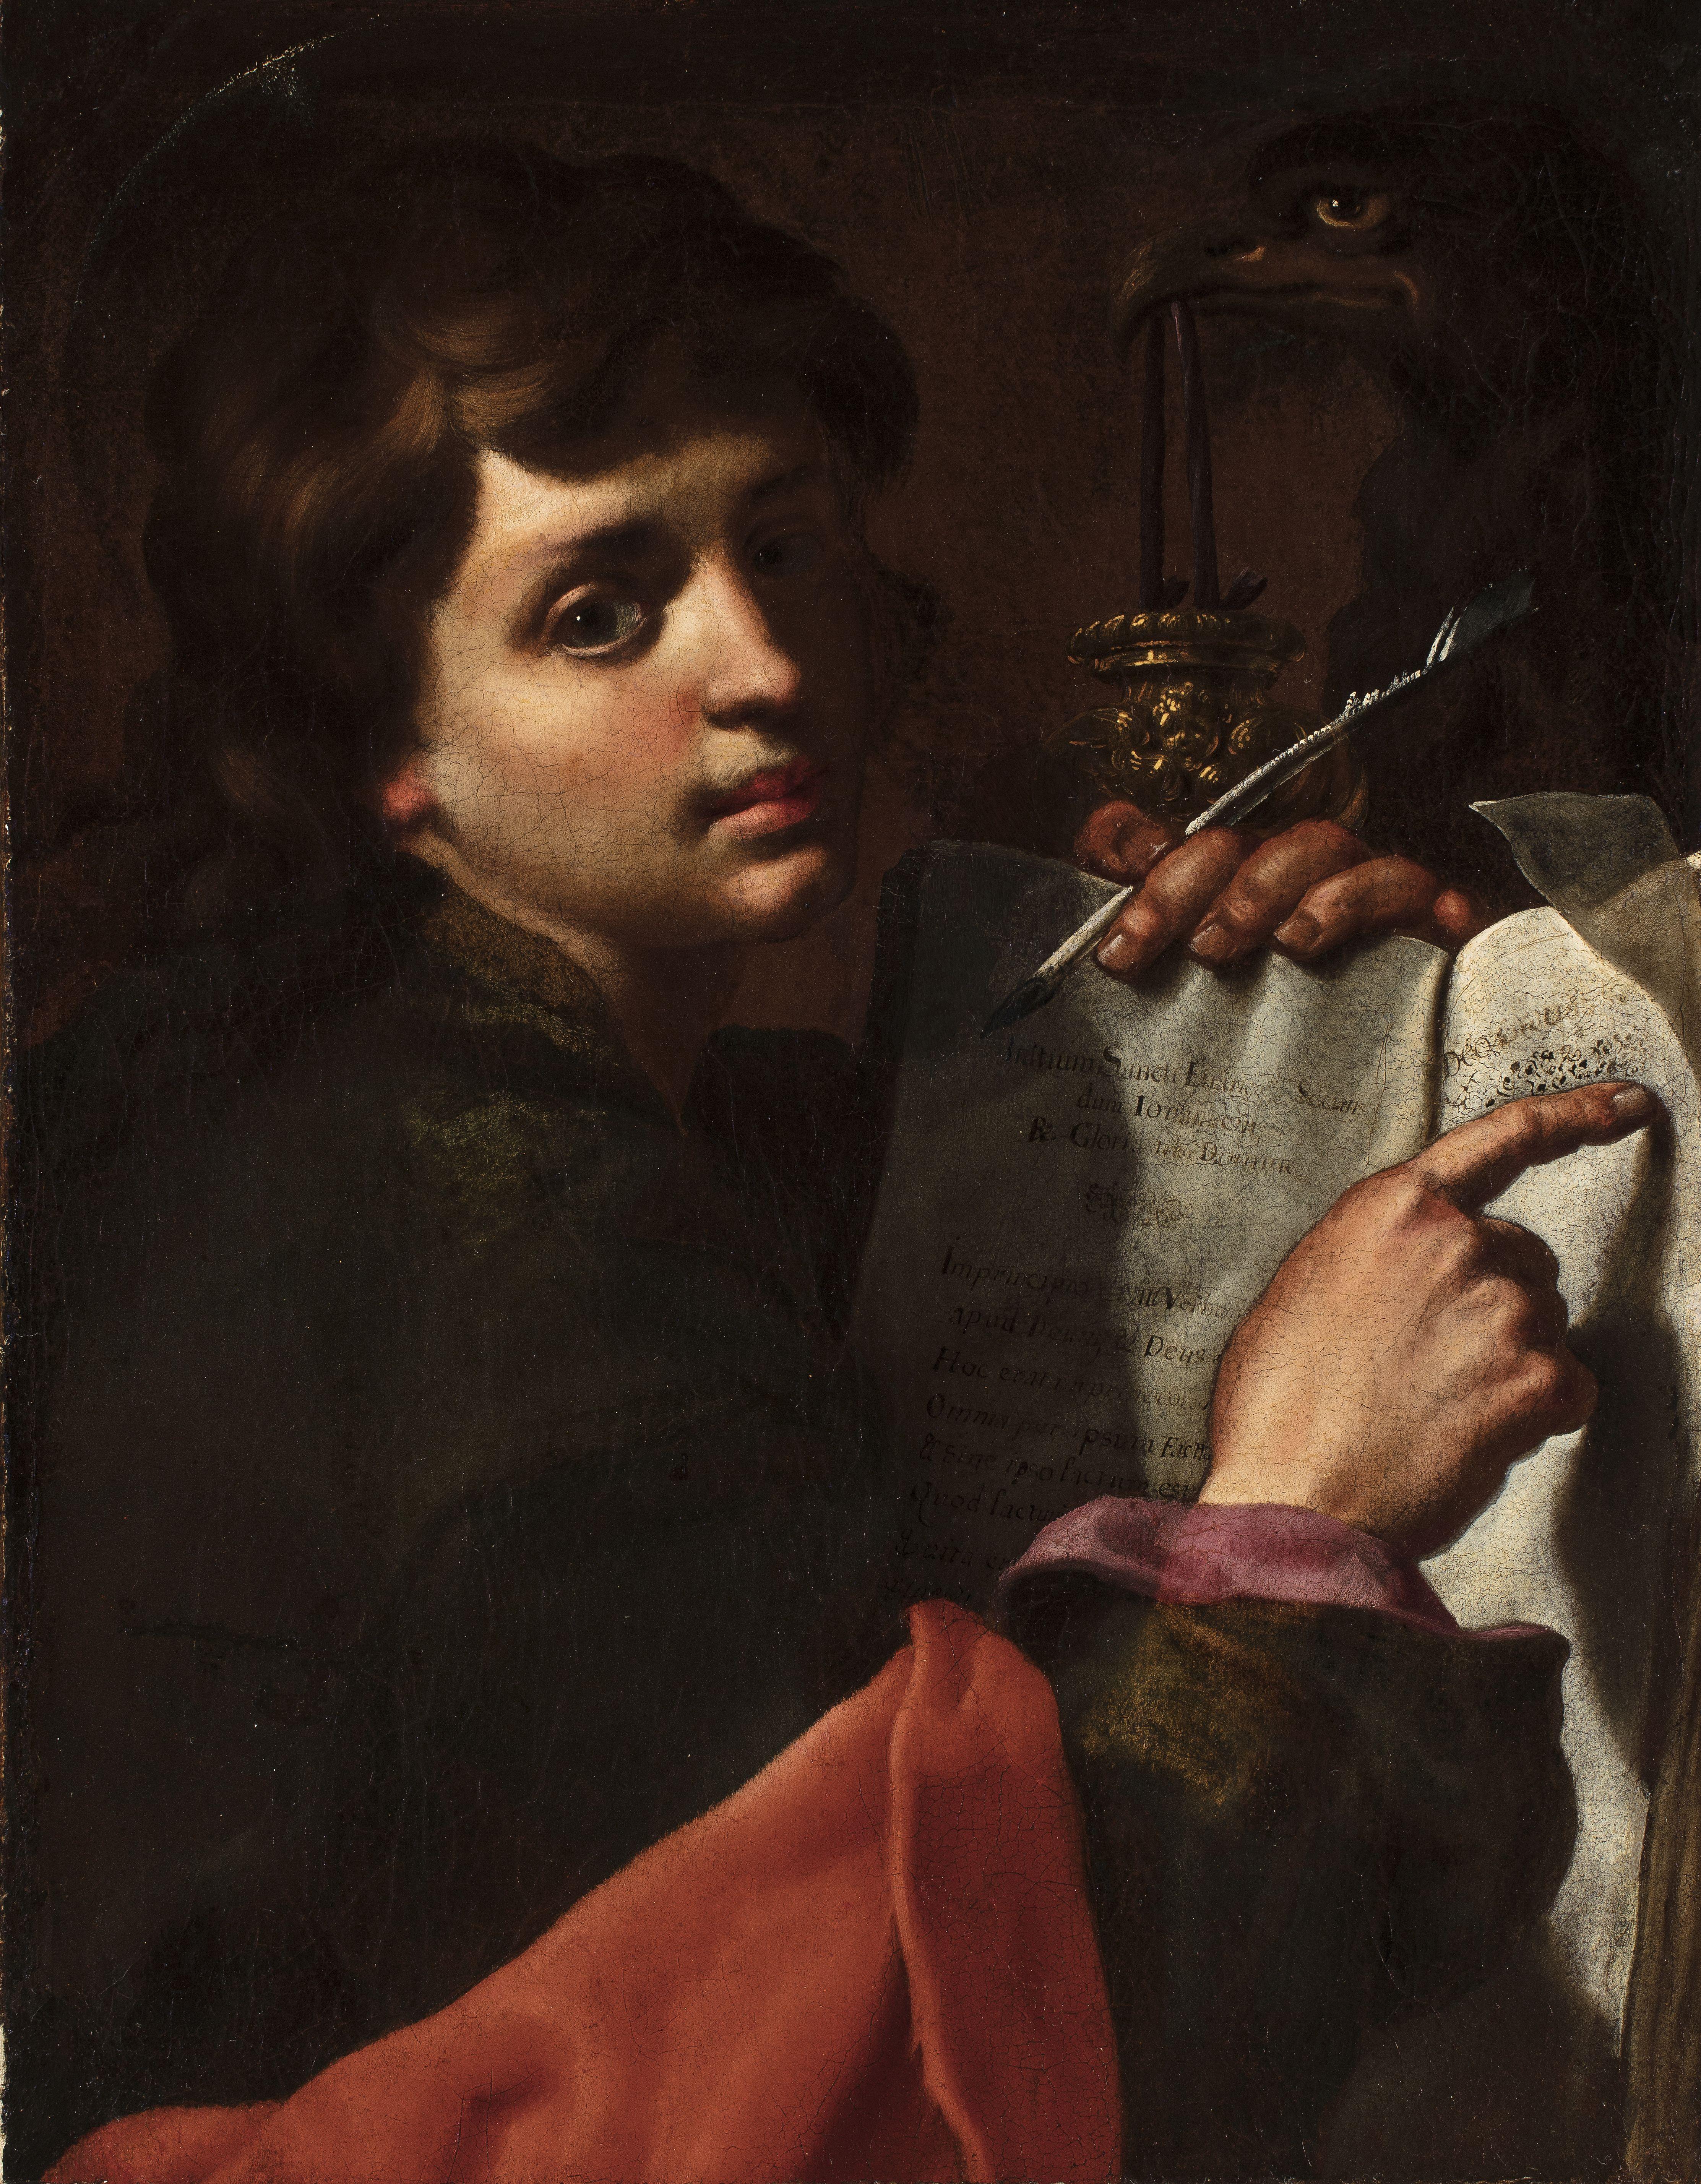 Alessandro Rosi, Saint John the Evangelist, Alessandro Rosi